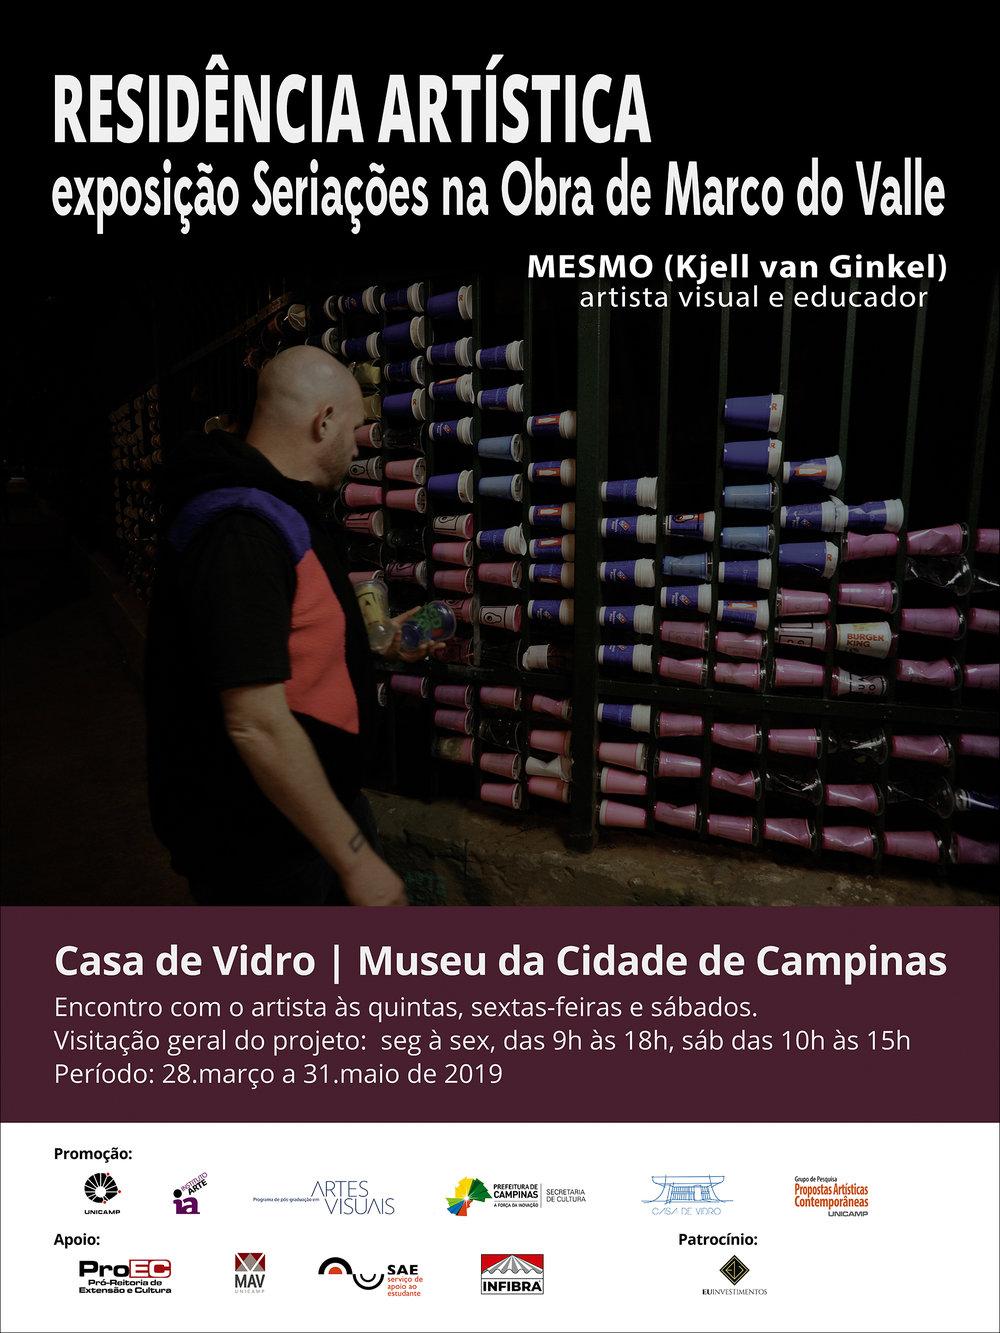 Artist Residence - Seriações na Obra de Marco do Valle (2019)